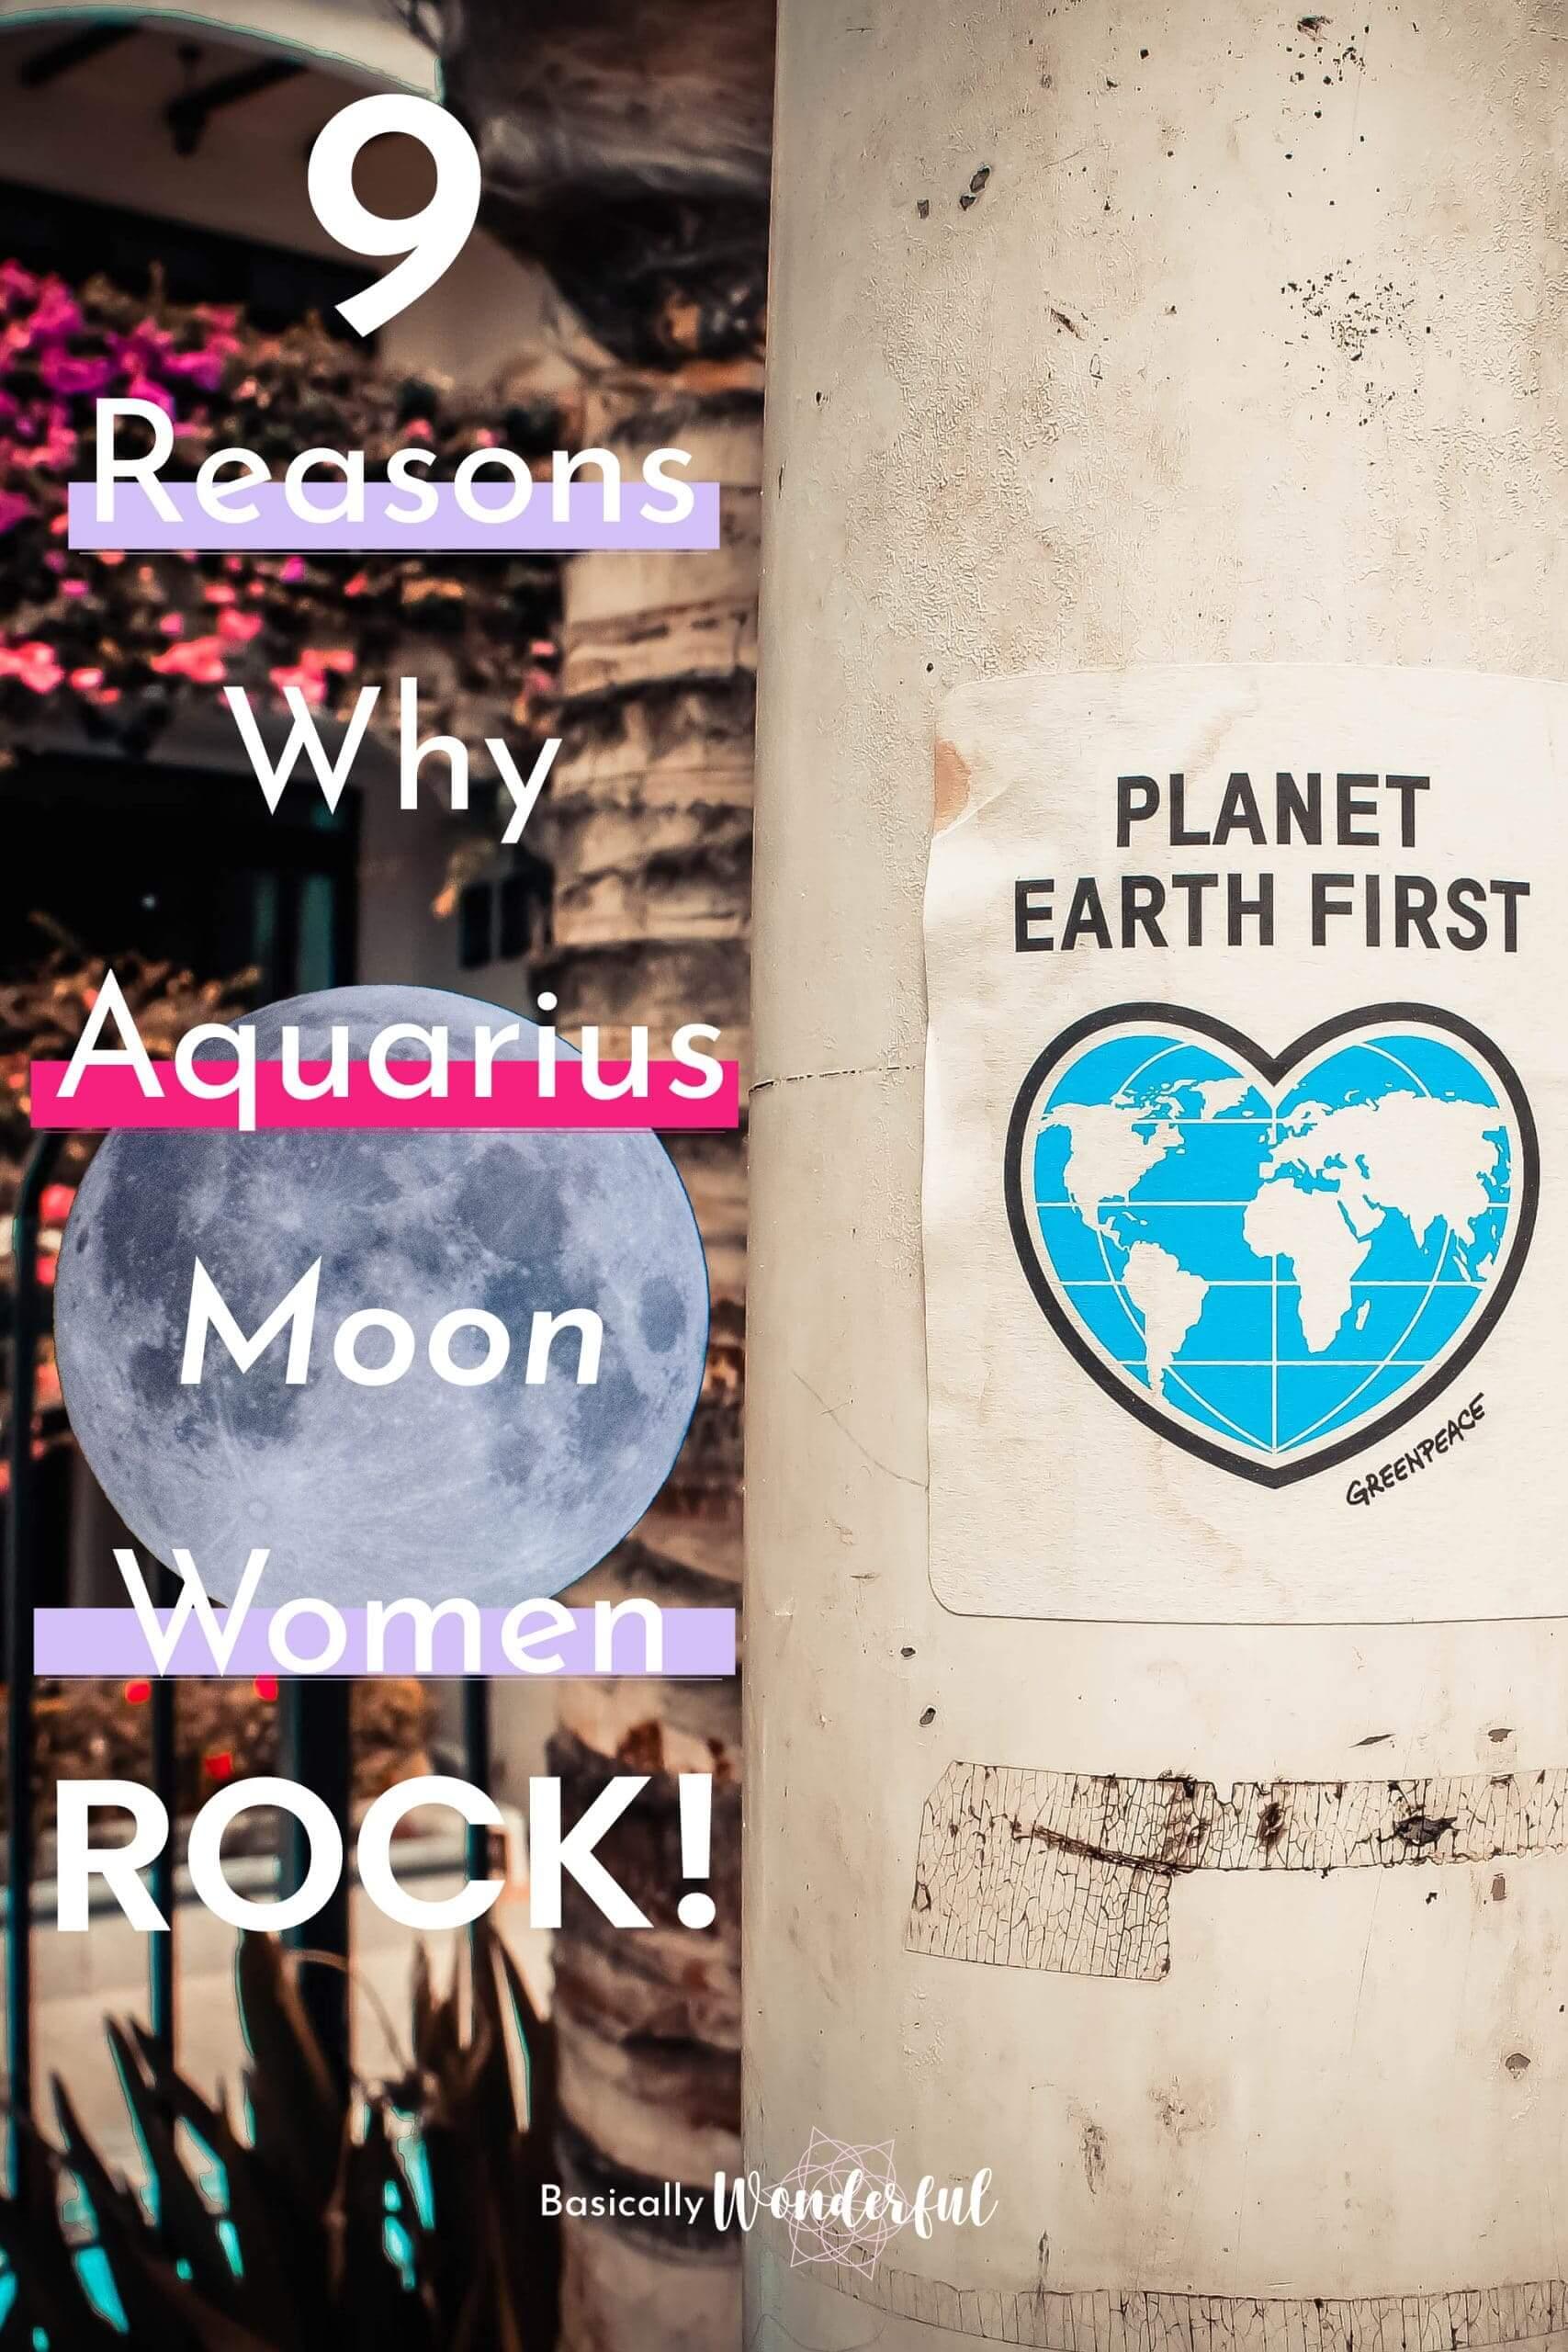 9 Reasons Why Aquarius Moon Women Rock